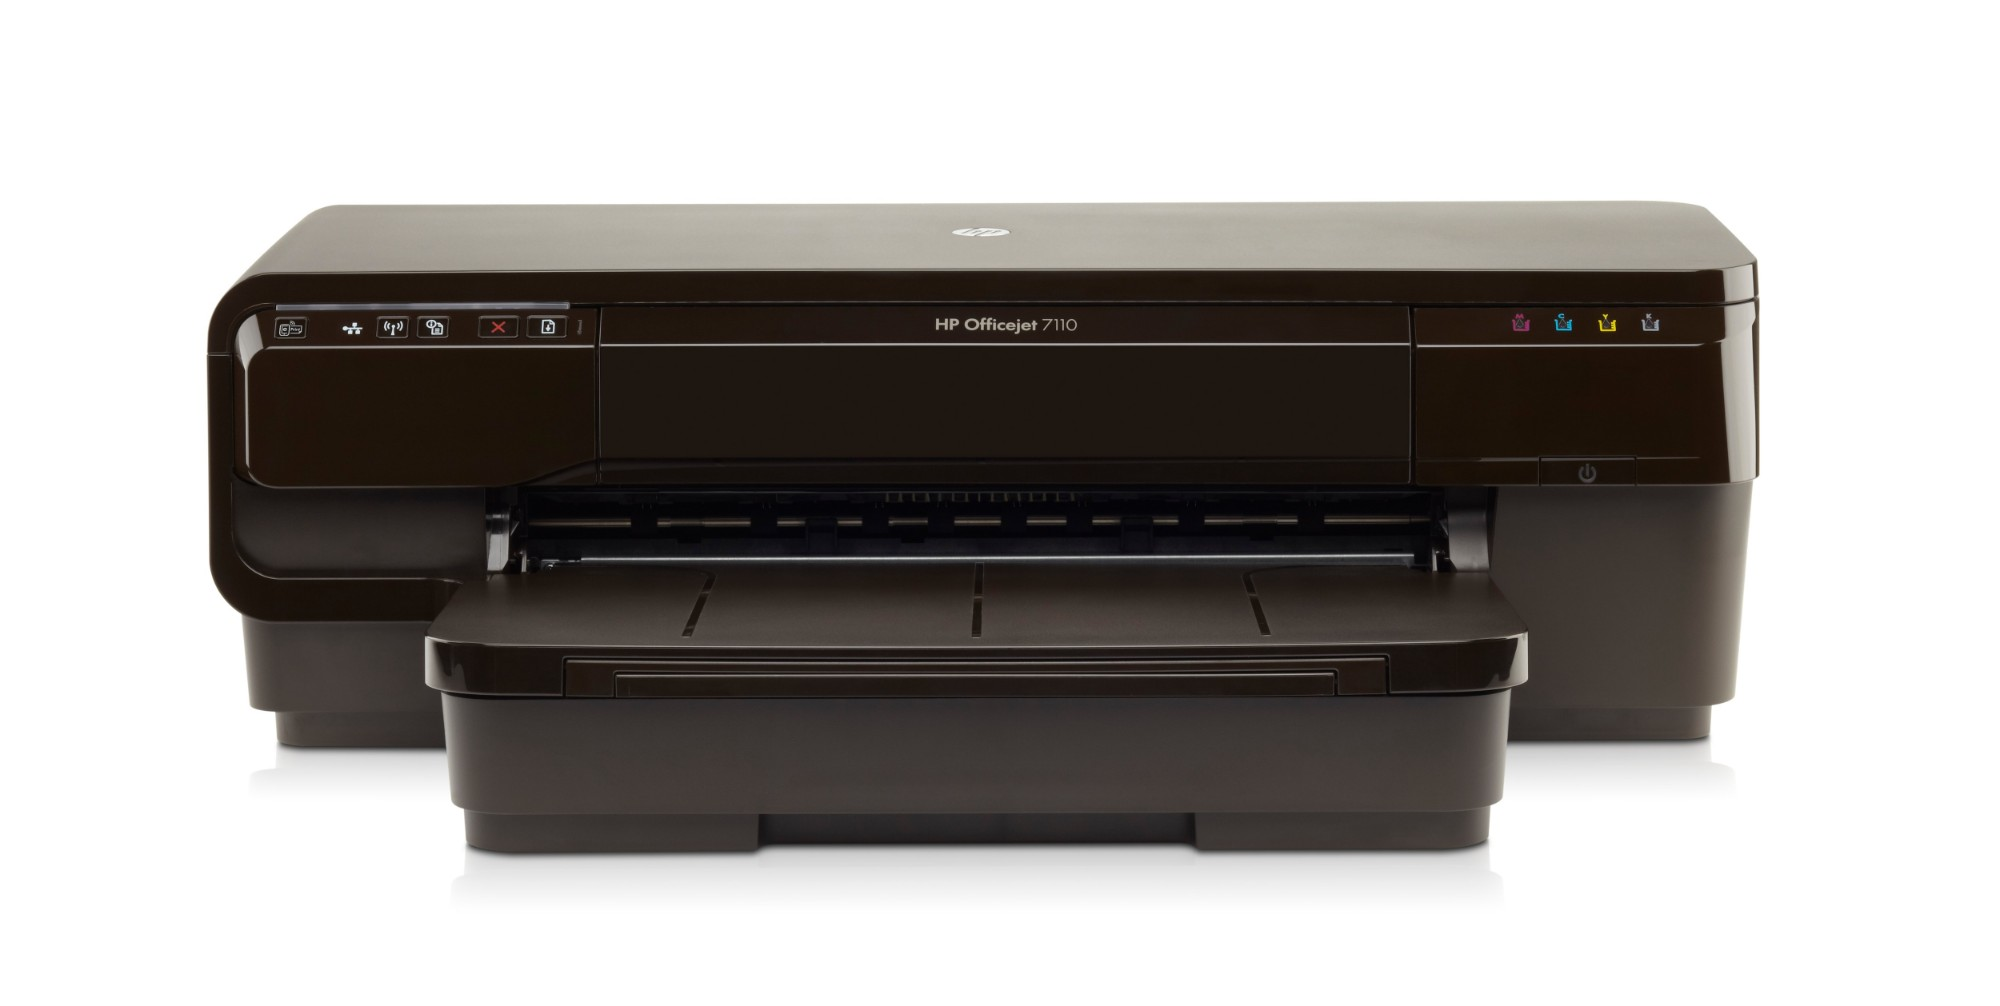 HP Officejet 7110 inkjet printer Colour 4800 x 1200 DPI A3 Wi-Fi